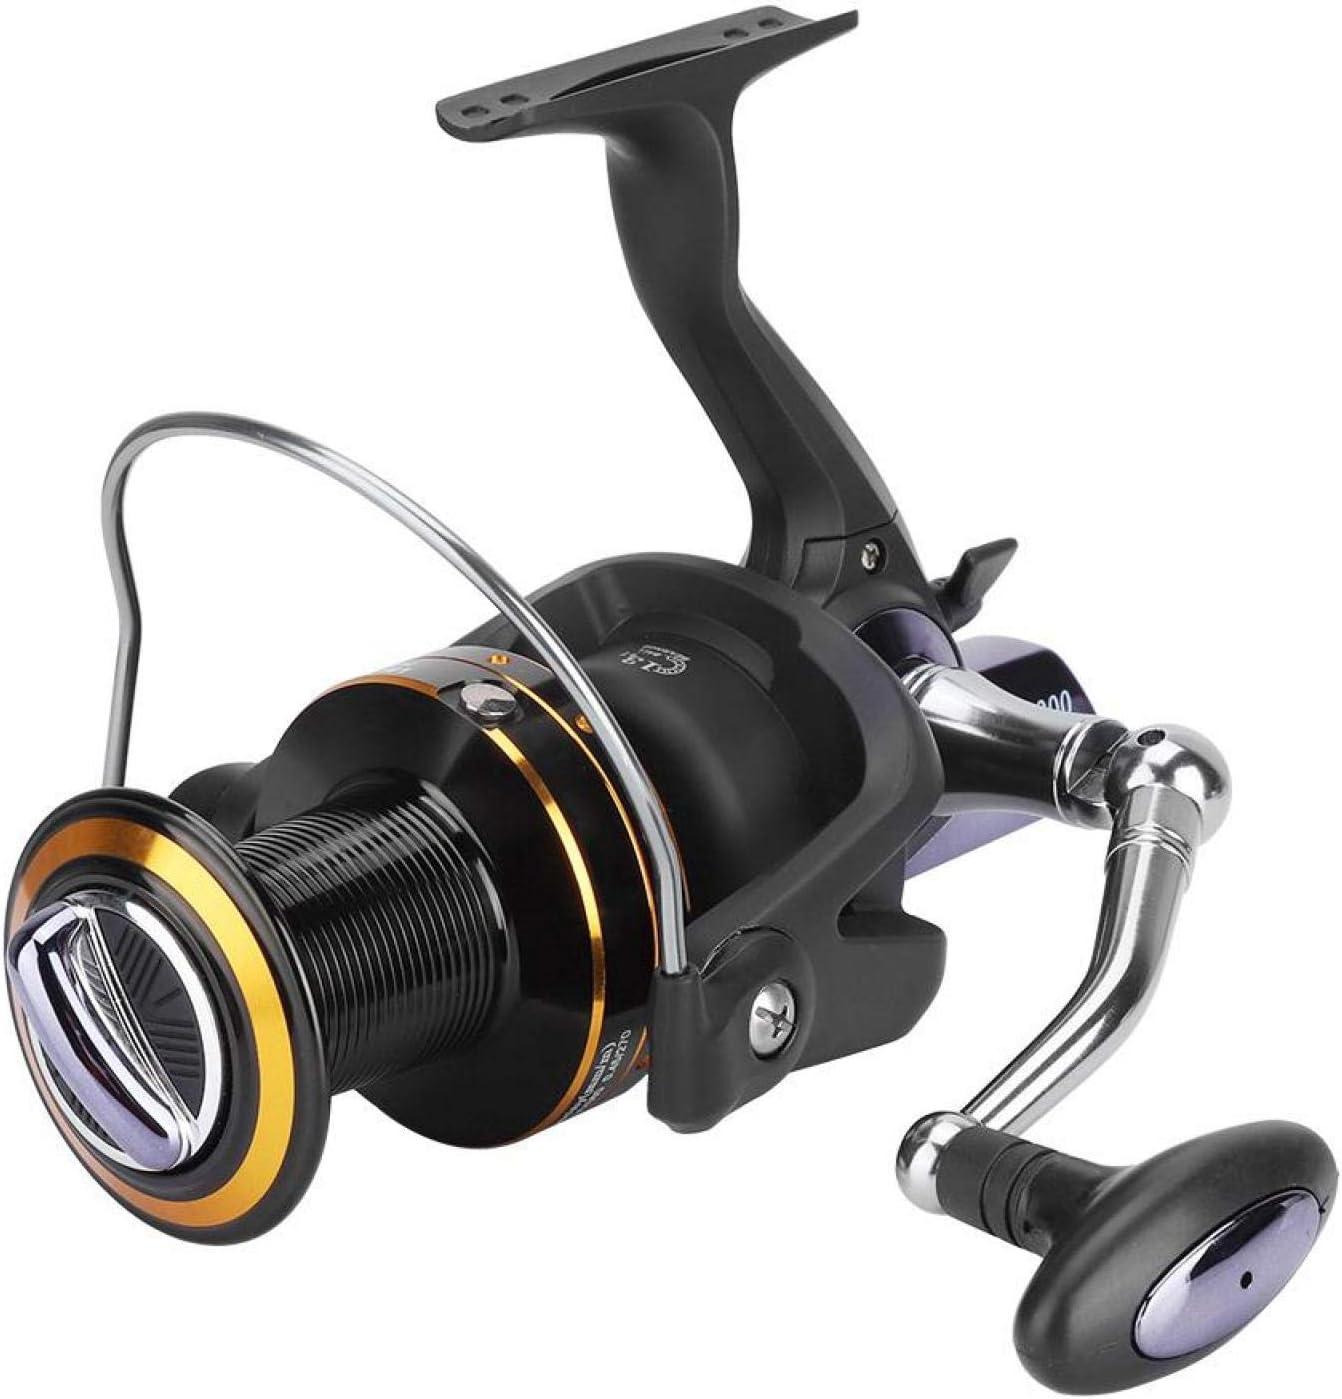 Max 49% OFF Cyrank Aluminium Alloy Spinning Fishing Translated Reels Reel L Baitcaster